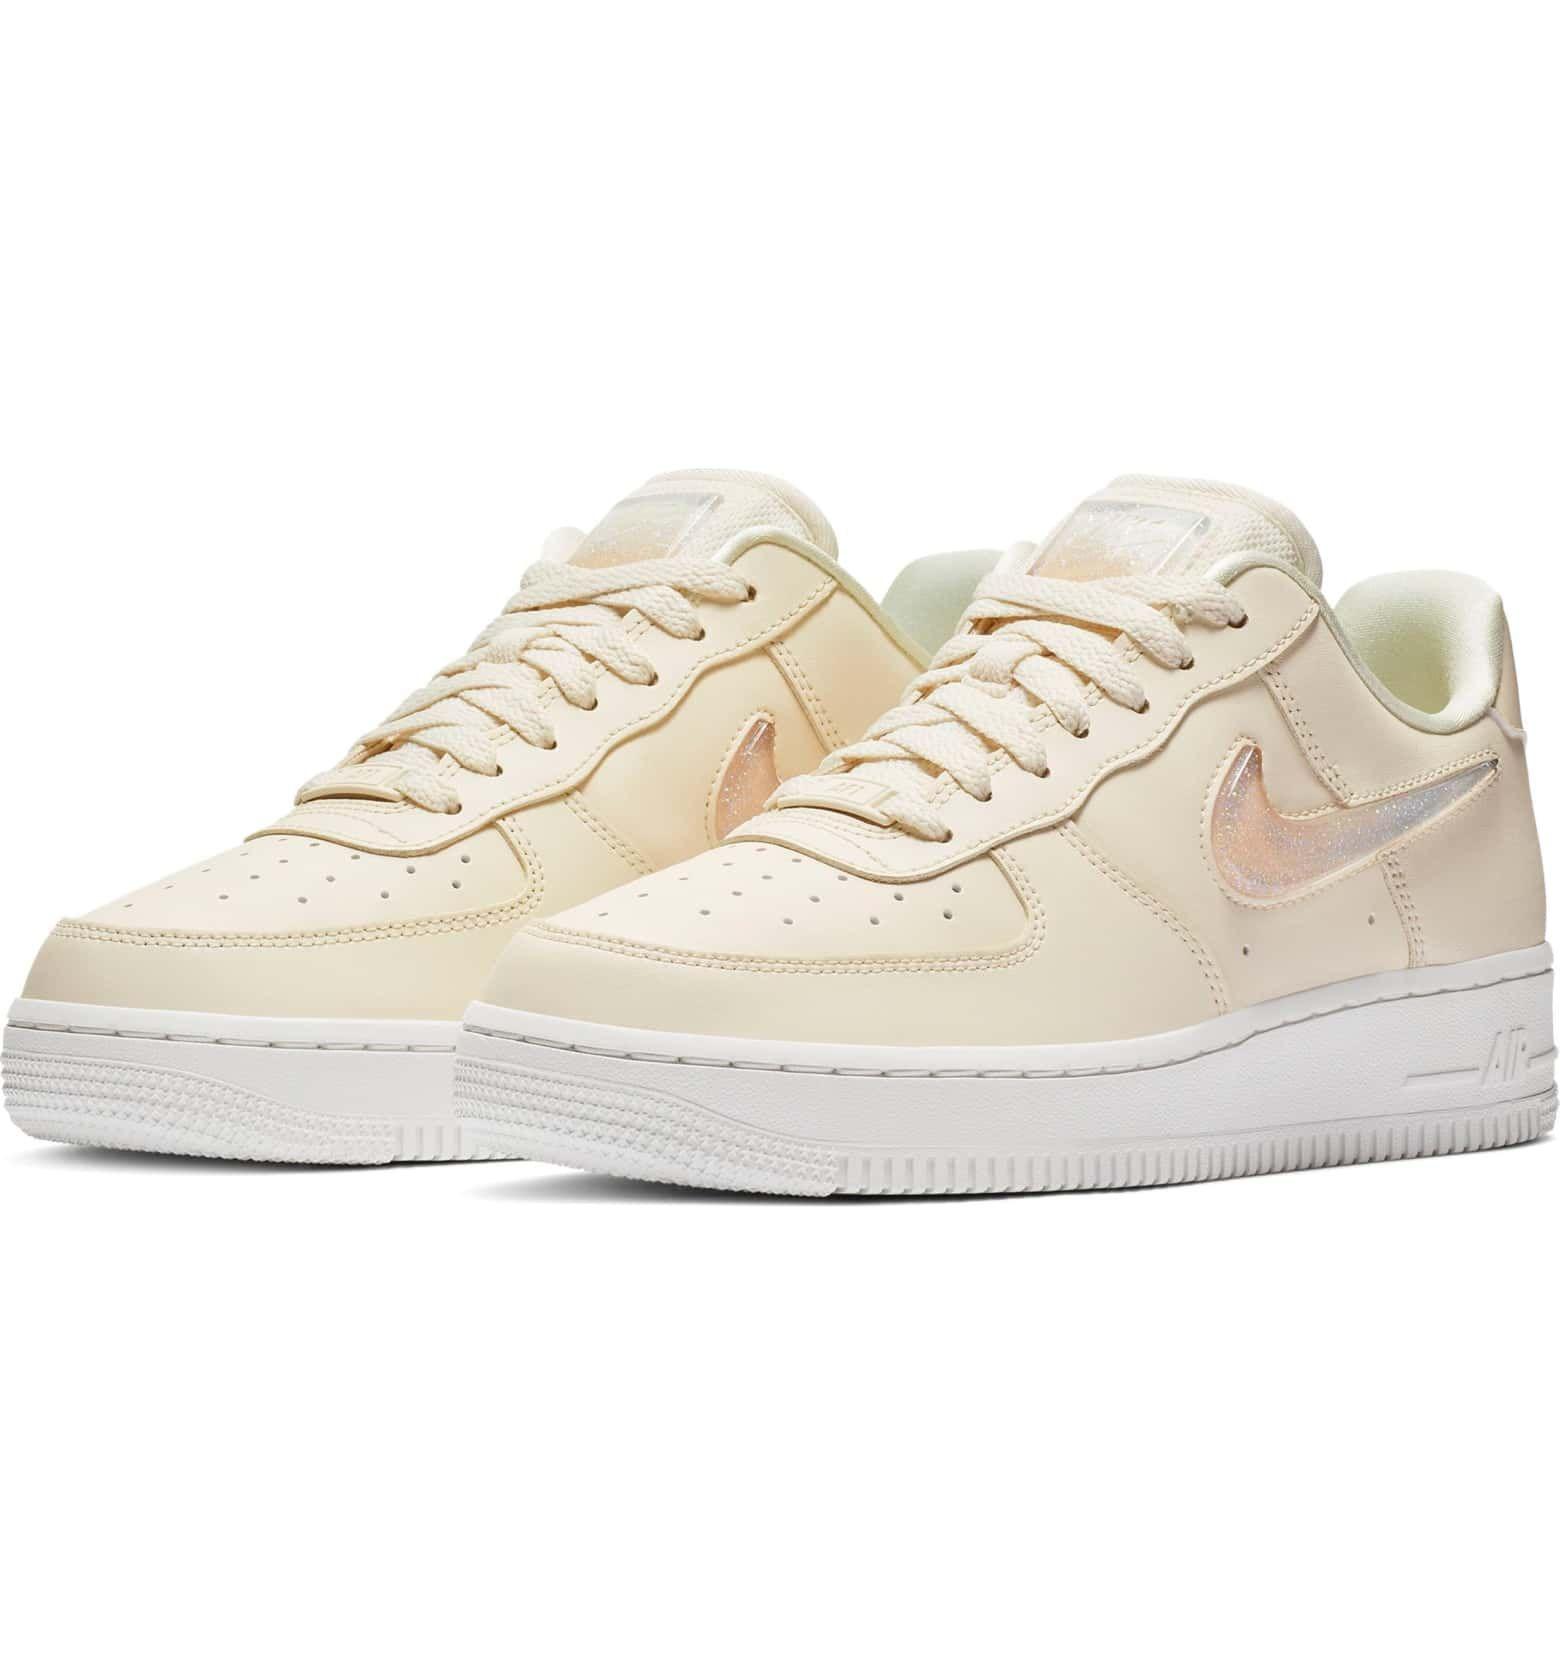 Nike Air Force 1 07 SE Premium Pale Ivory | HYPEBAE